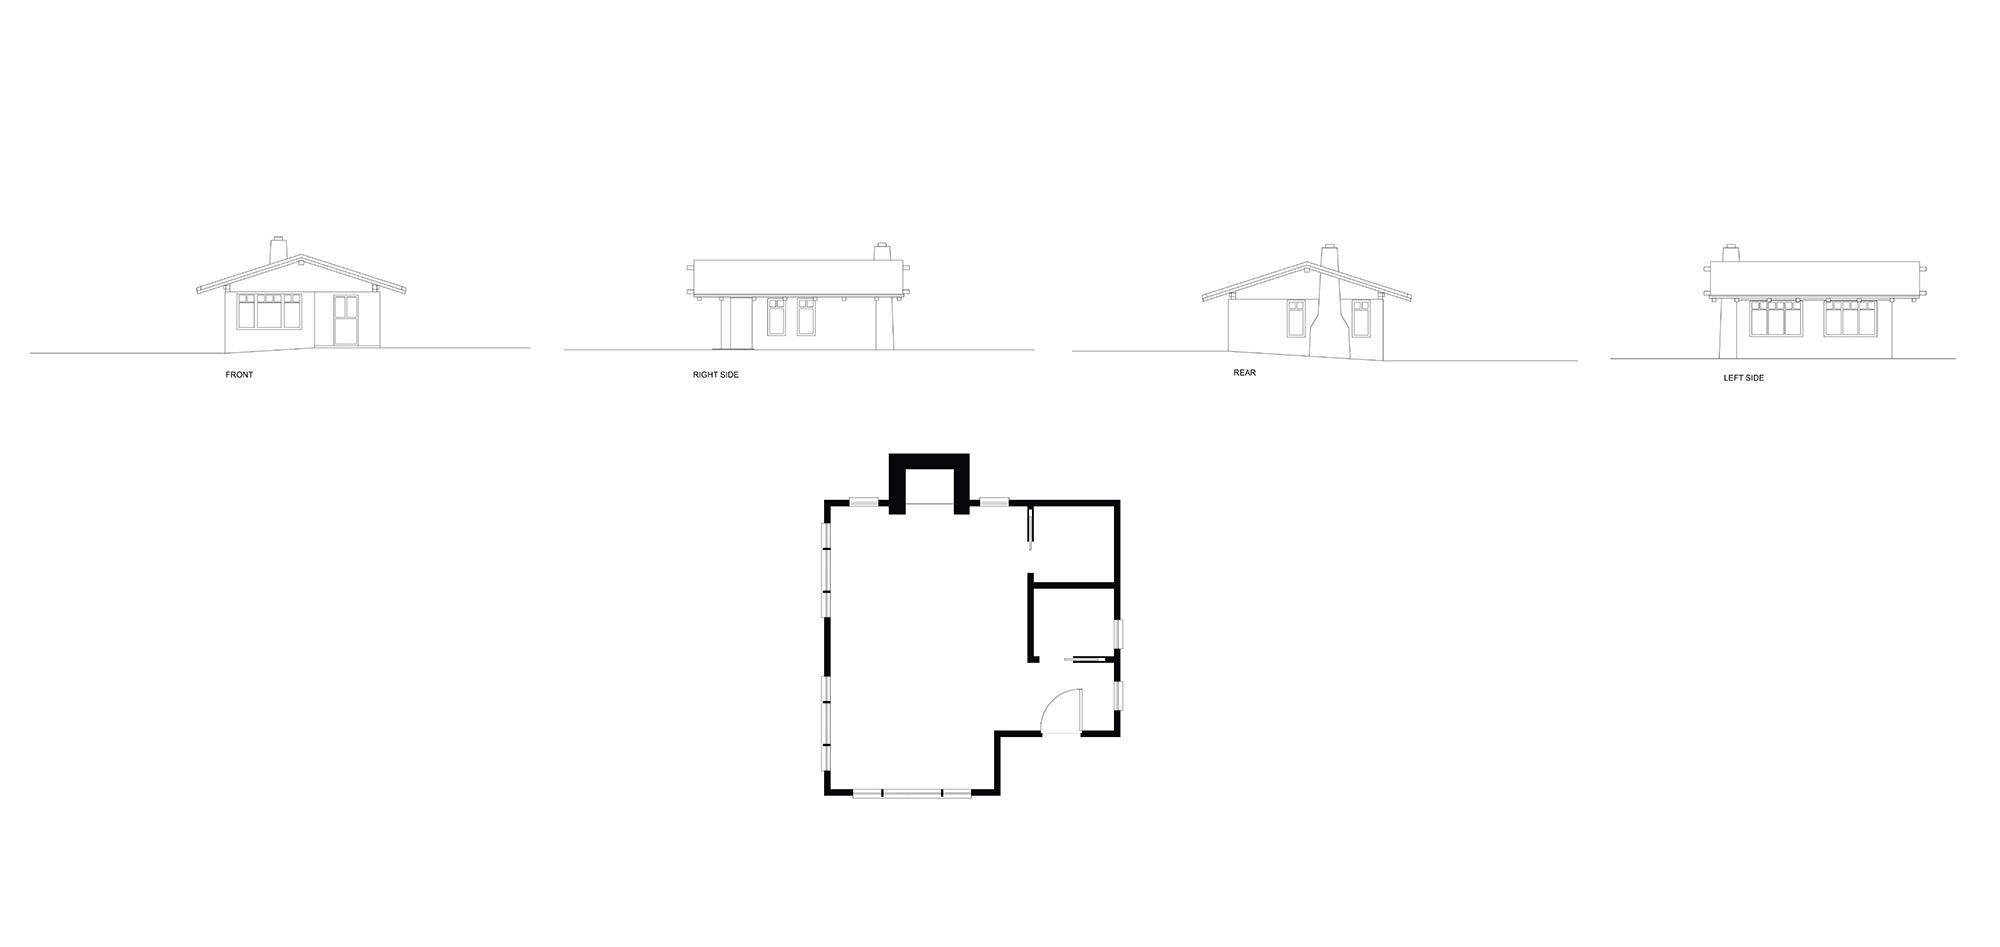 Studio Elevations & Floorplan